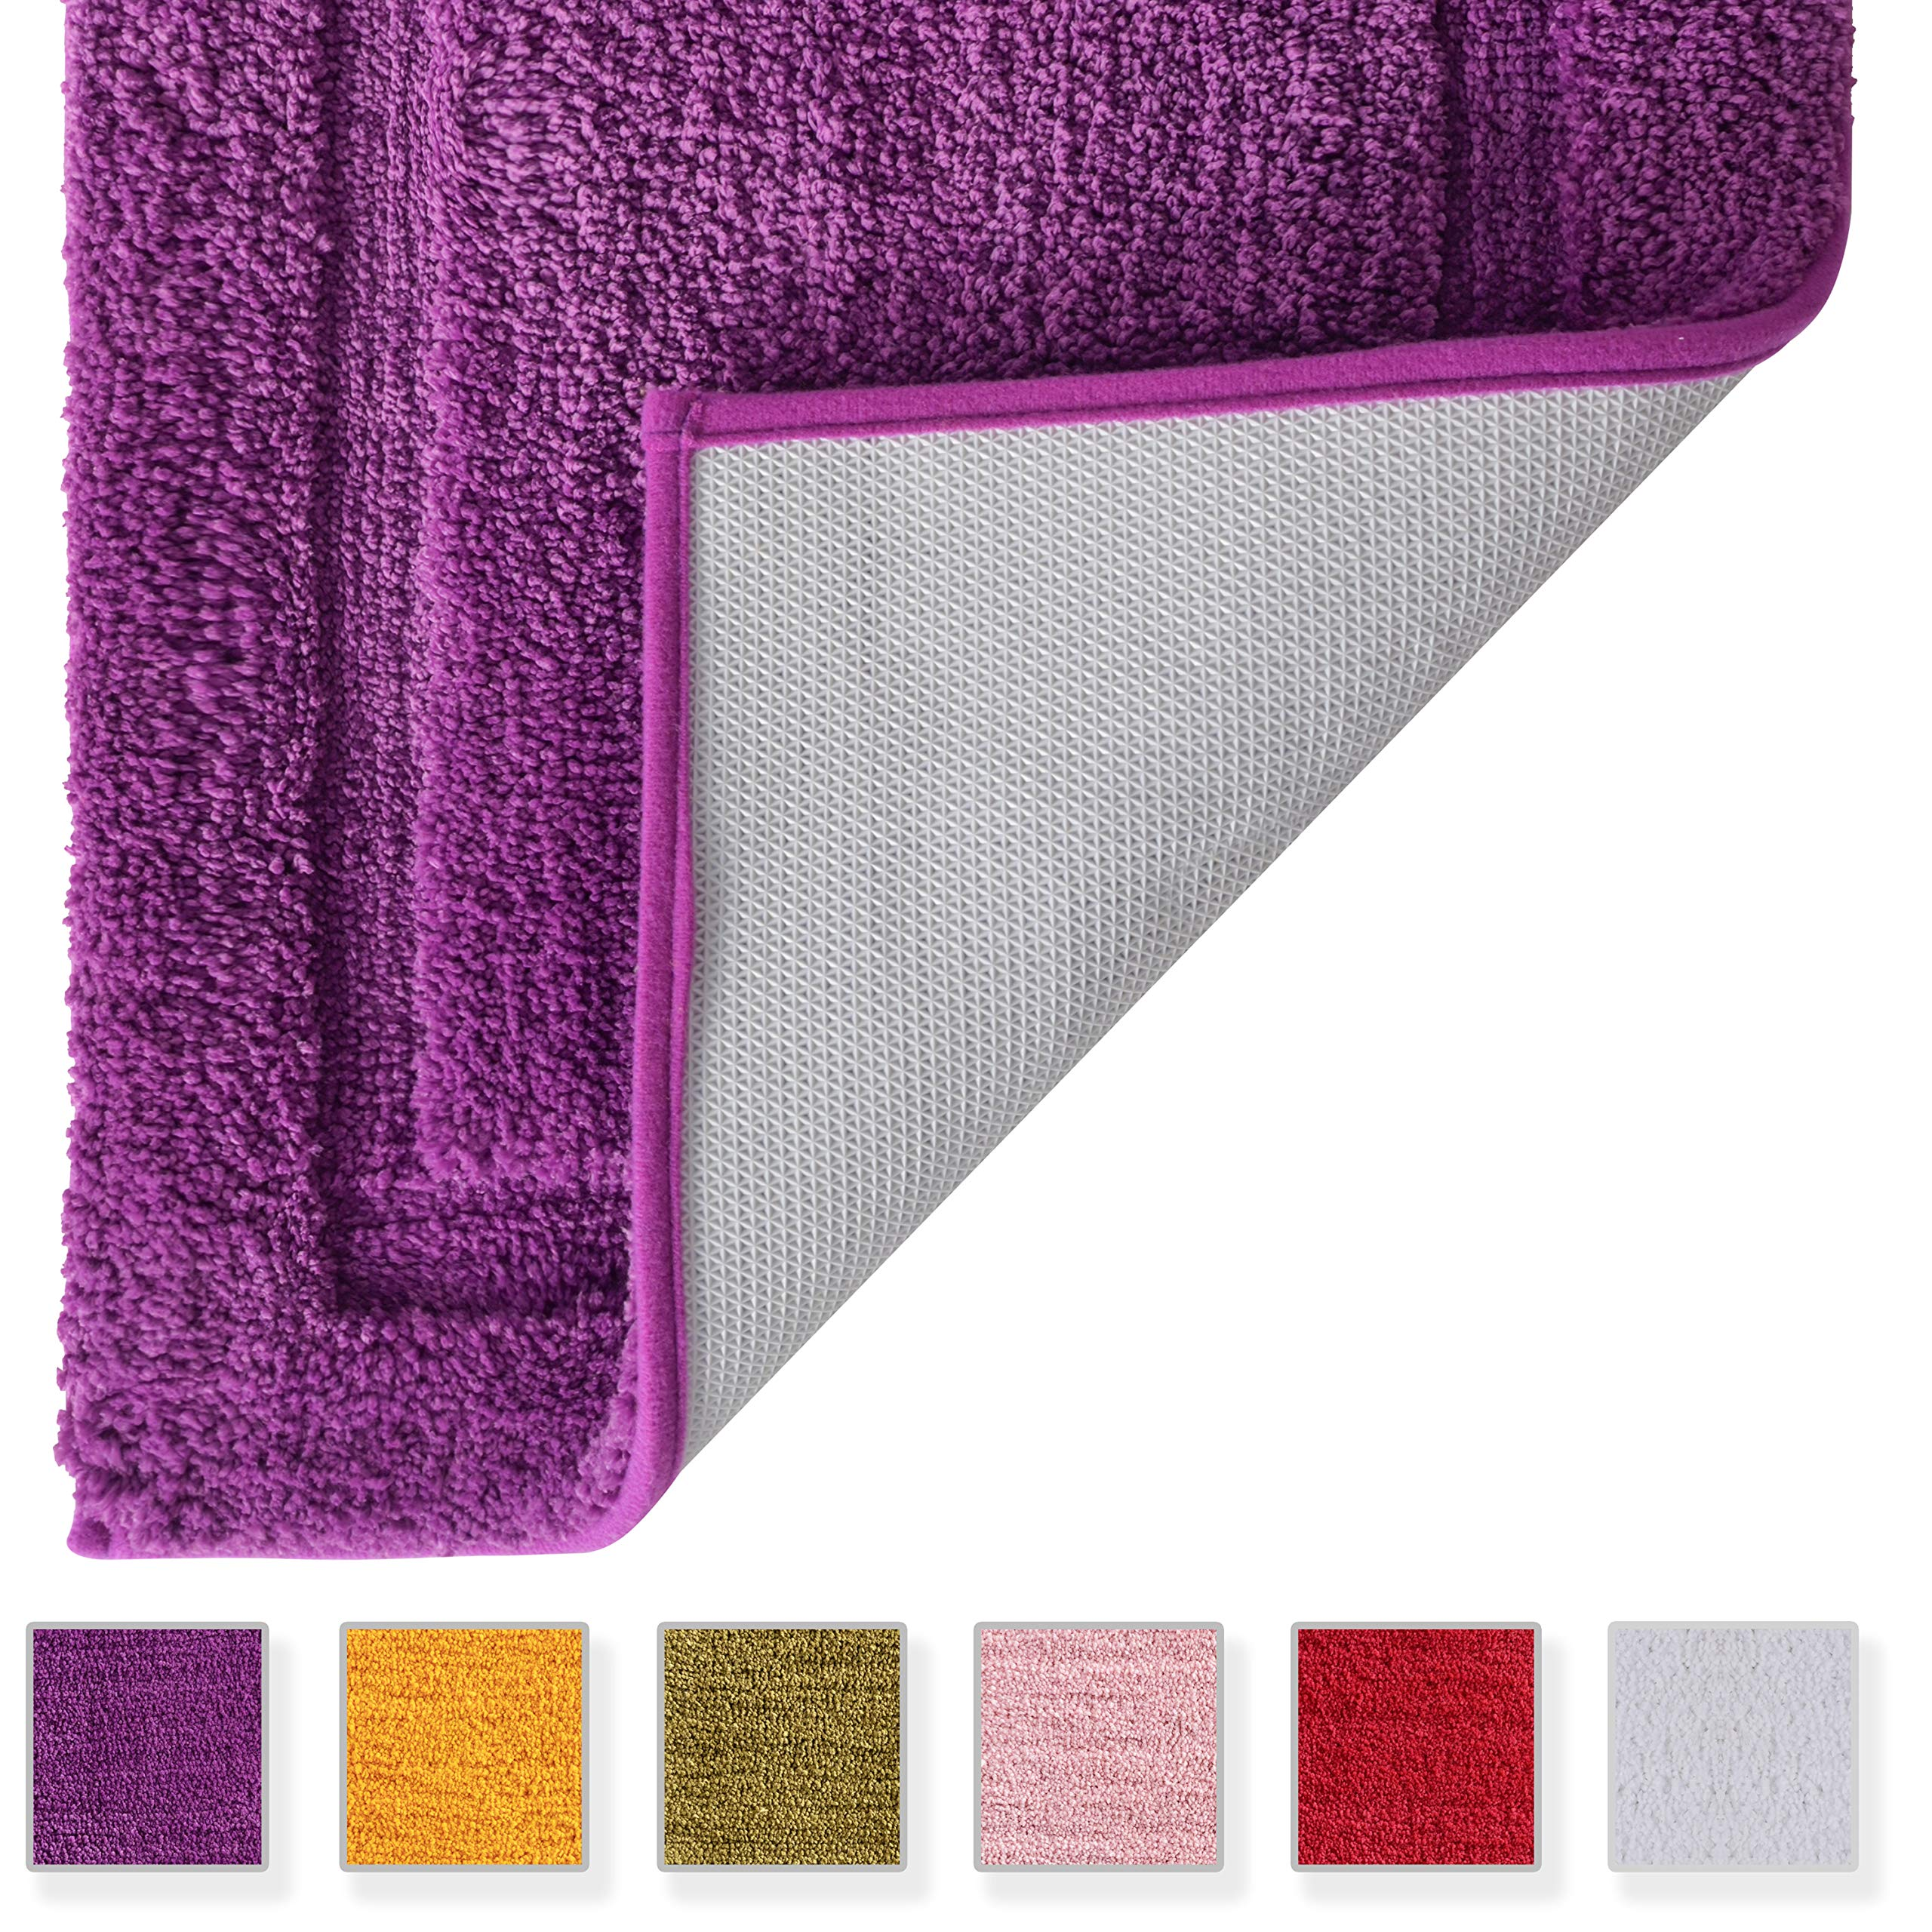 TOMORO Microfiber Non-Slip Bathroom Rug – Extra Absorbent and Quick Dry, Soft Luxury Hotel Door Carpet Shower Bath Mat Waterproof Non-Skid Backing (17.5 x 27 inch, Purple)